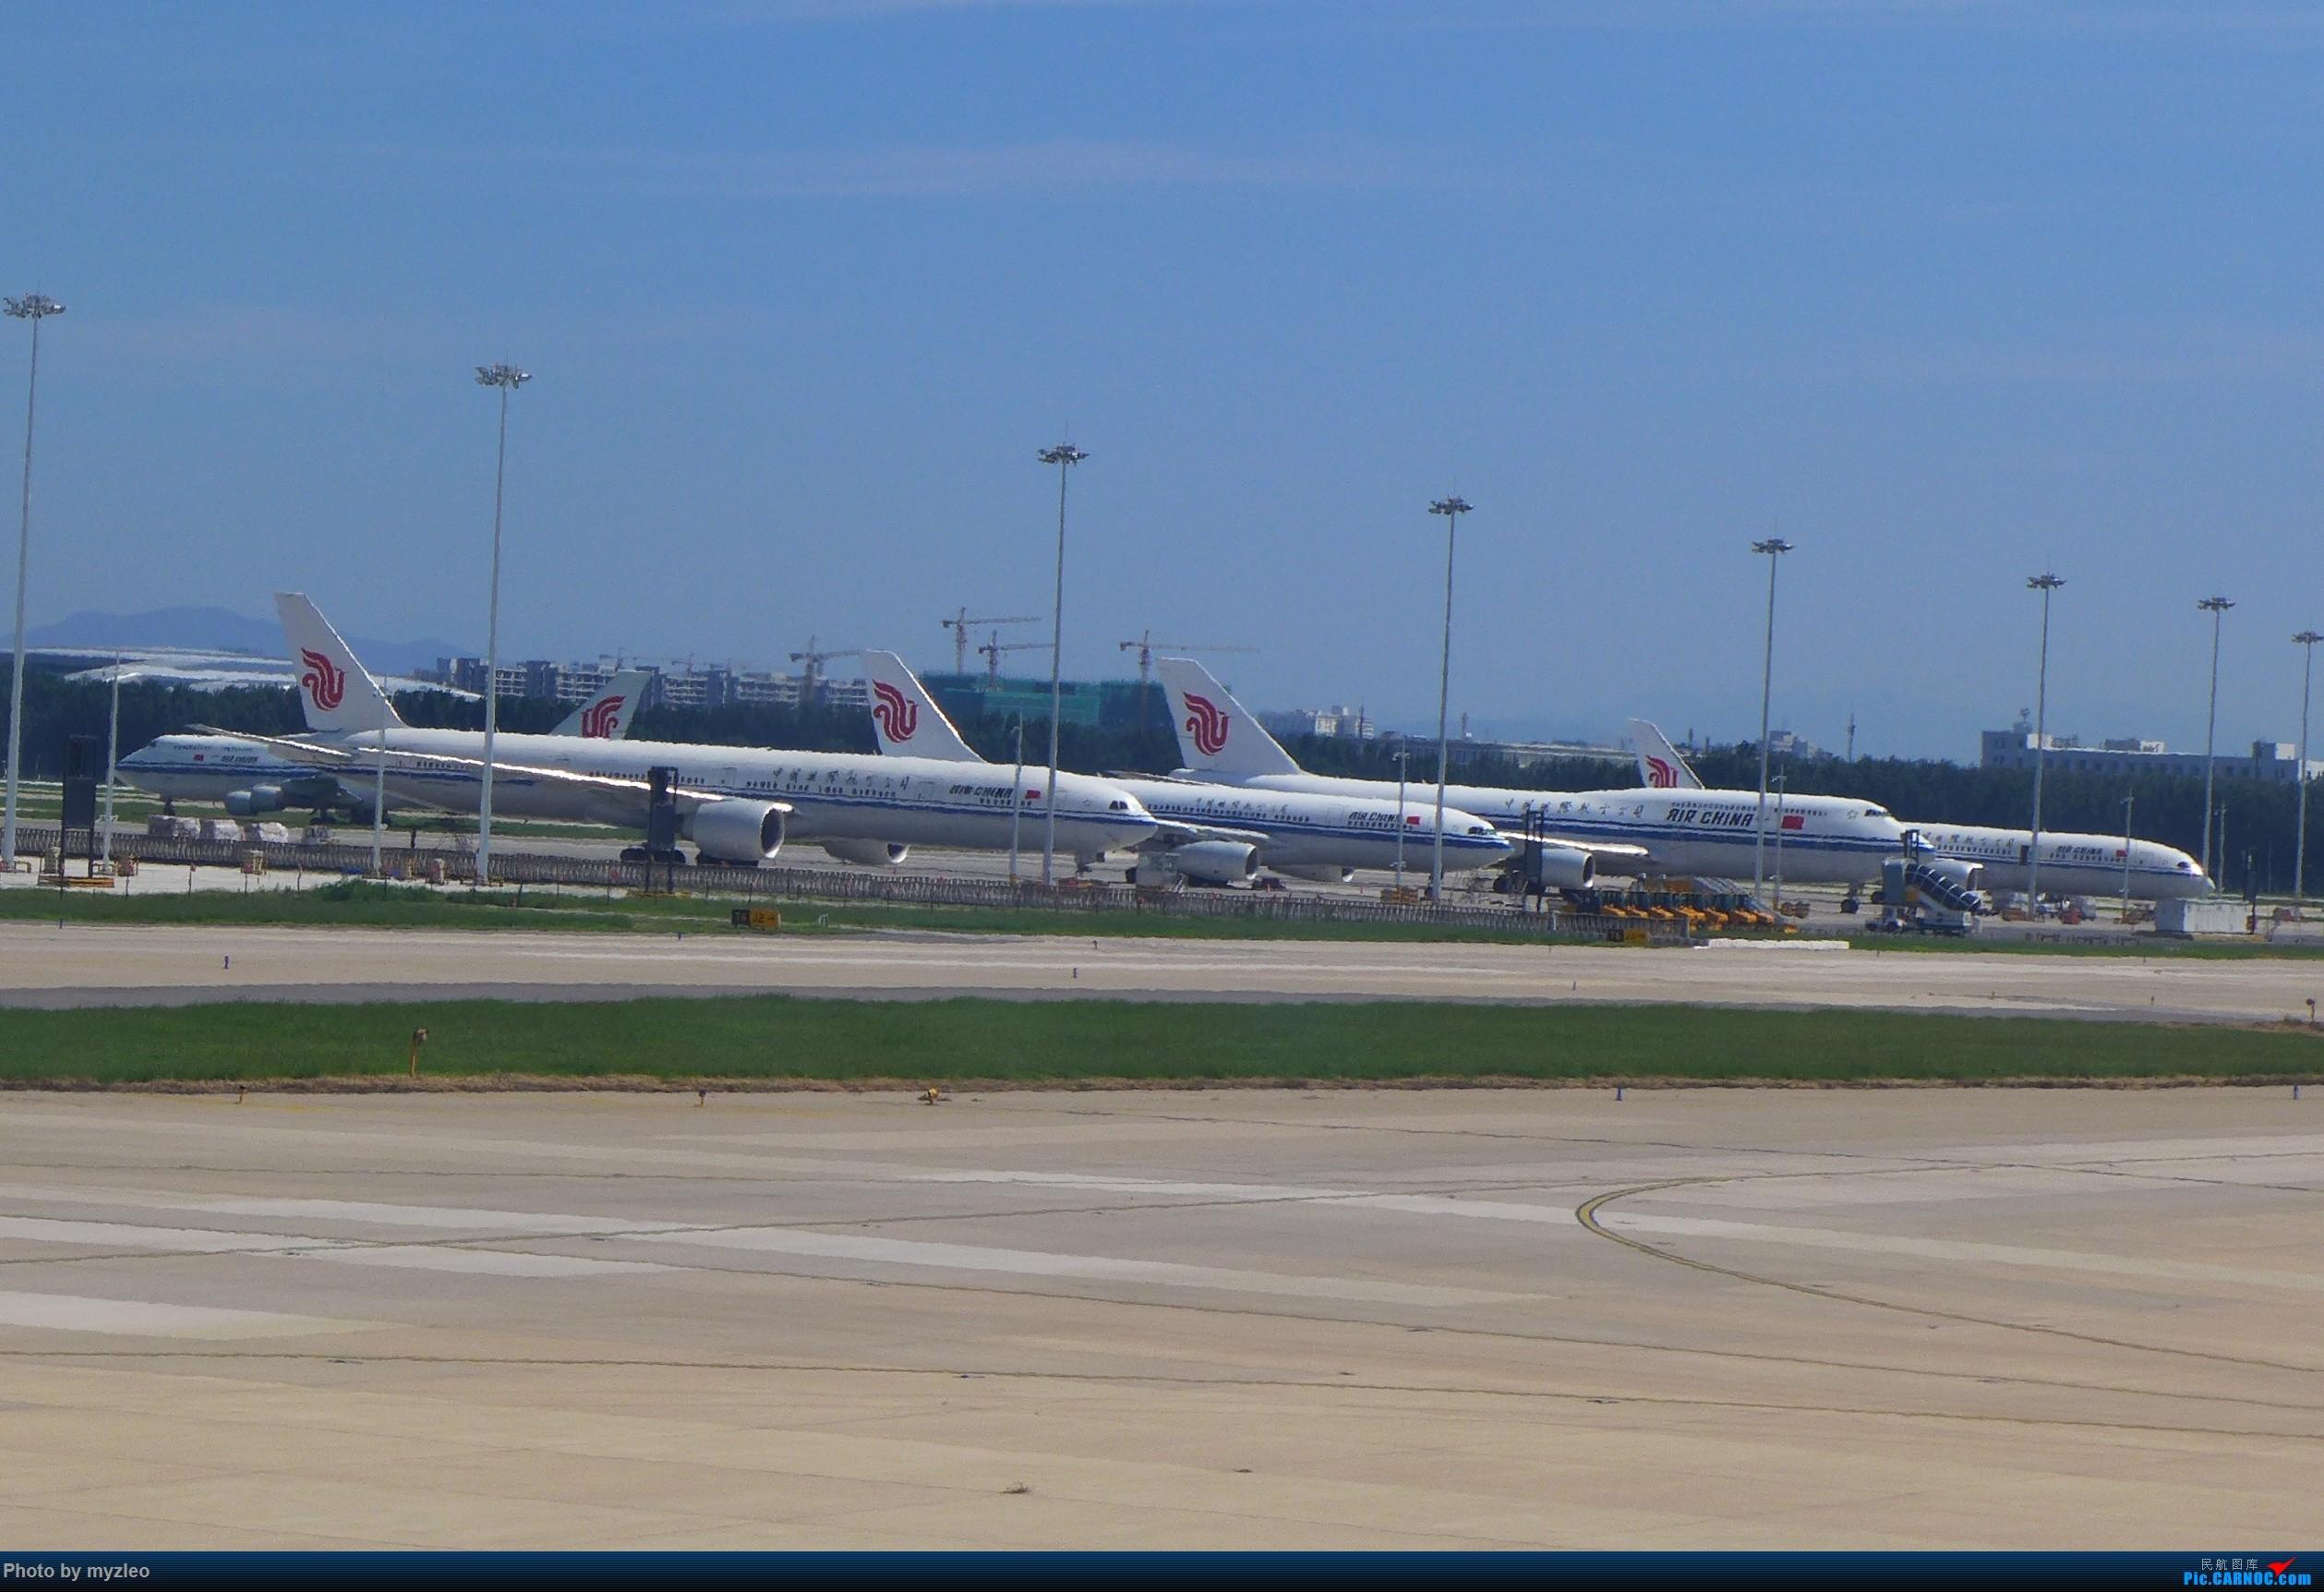 Re:[原创]【myzleo的游记3.1】三访帝都——记一次意外的惊喜,大鹅头初遇,第一次去中关村 BOEING 747-8I B-2486 中国北京首都国际机场 中国北京首都国际机场